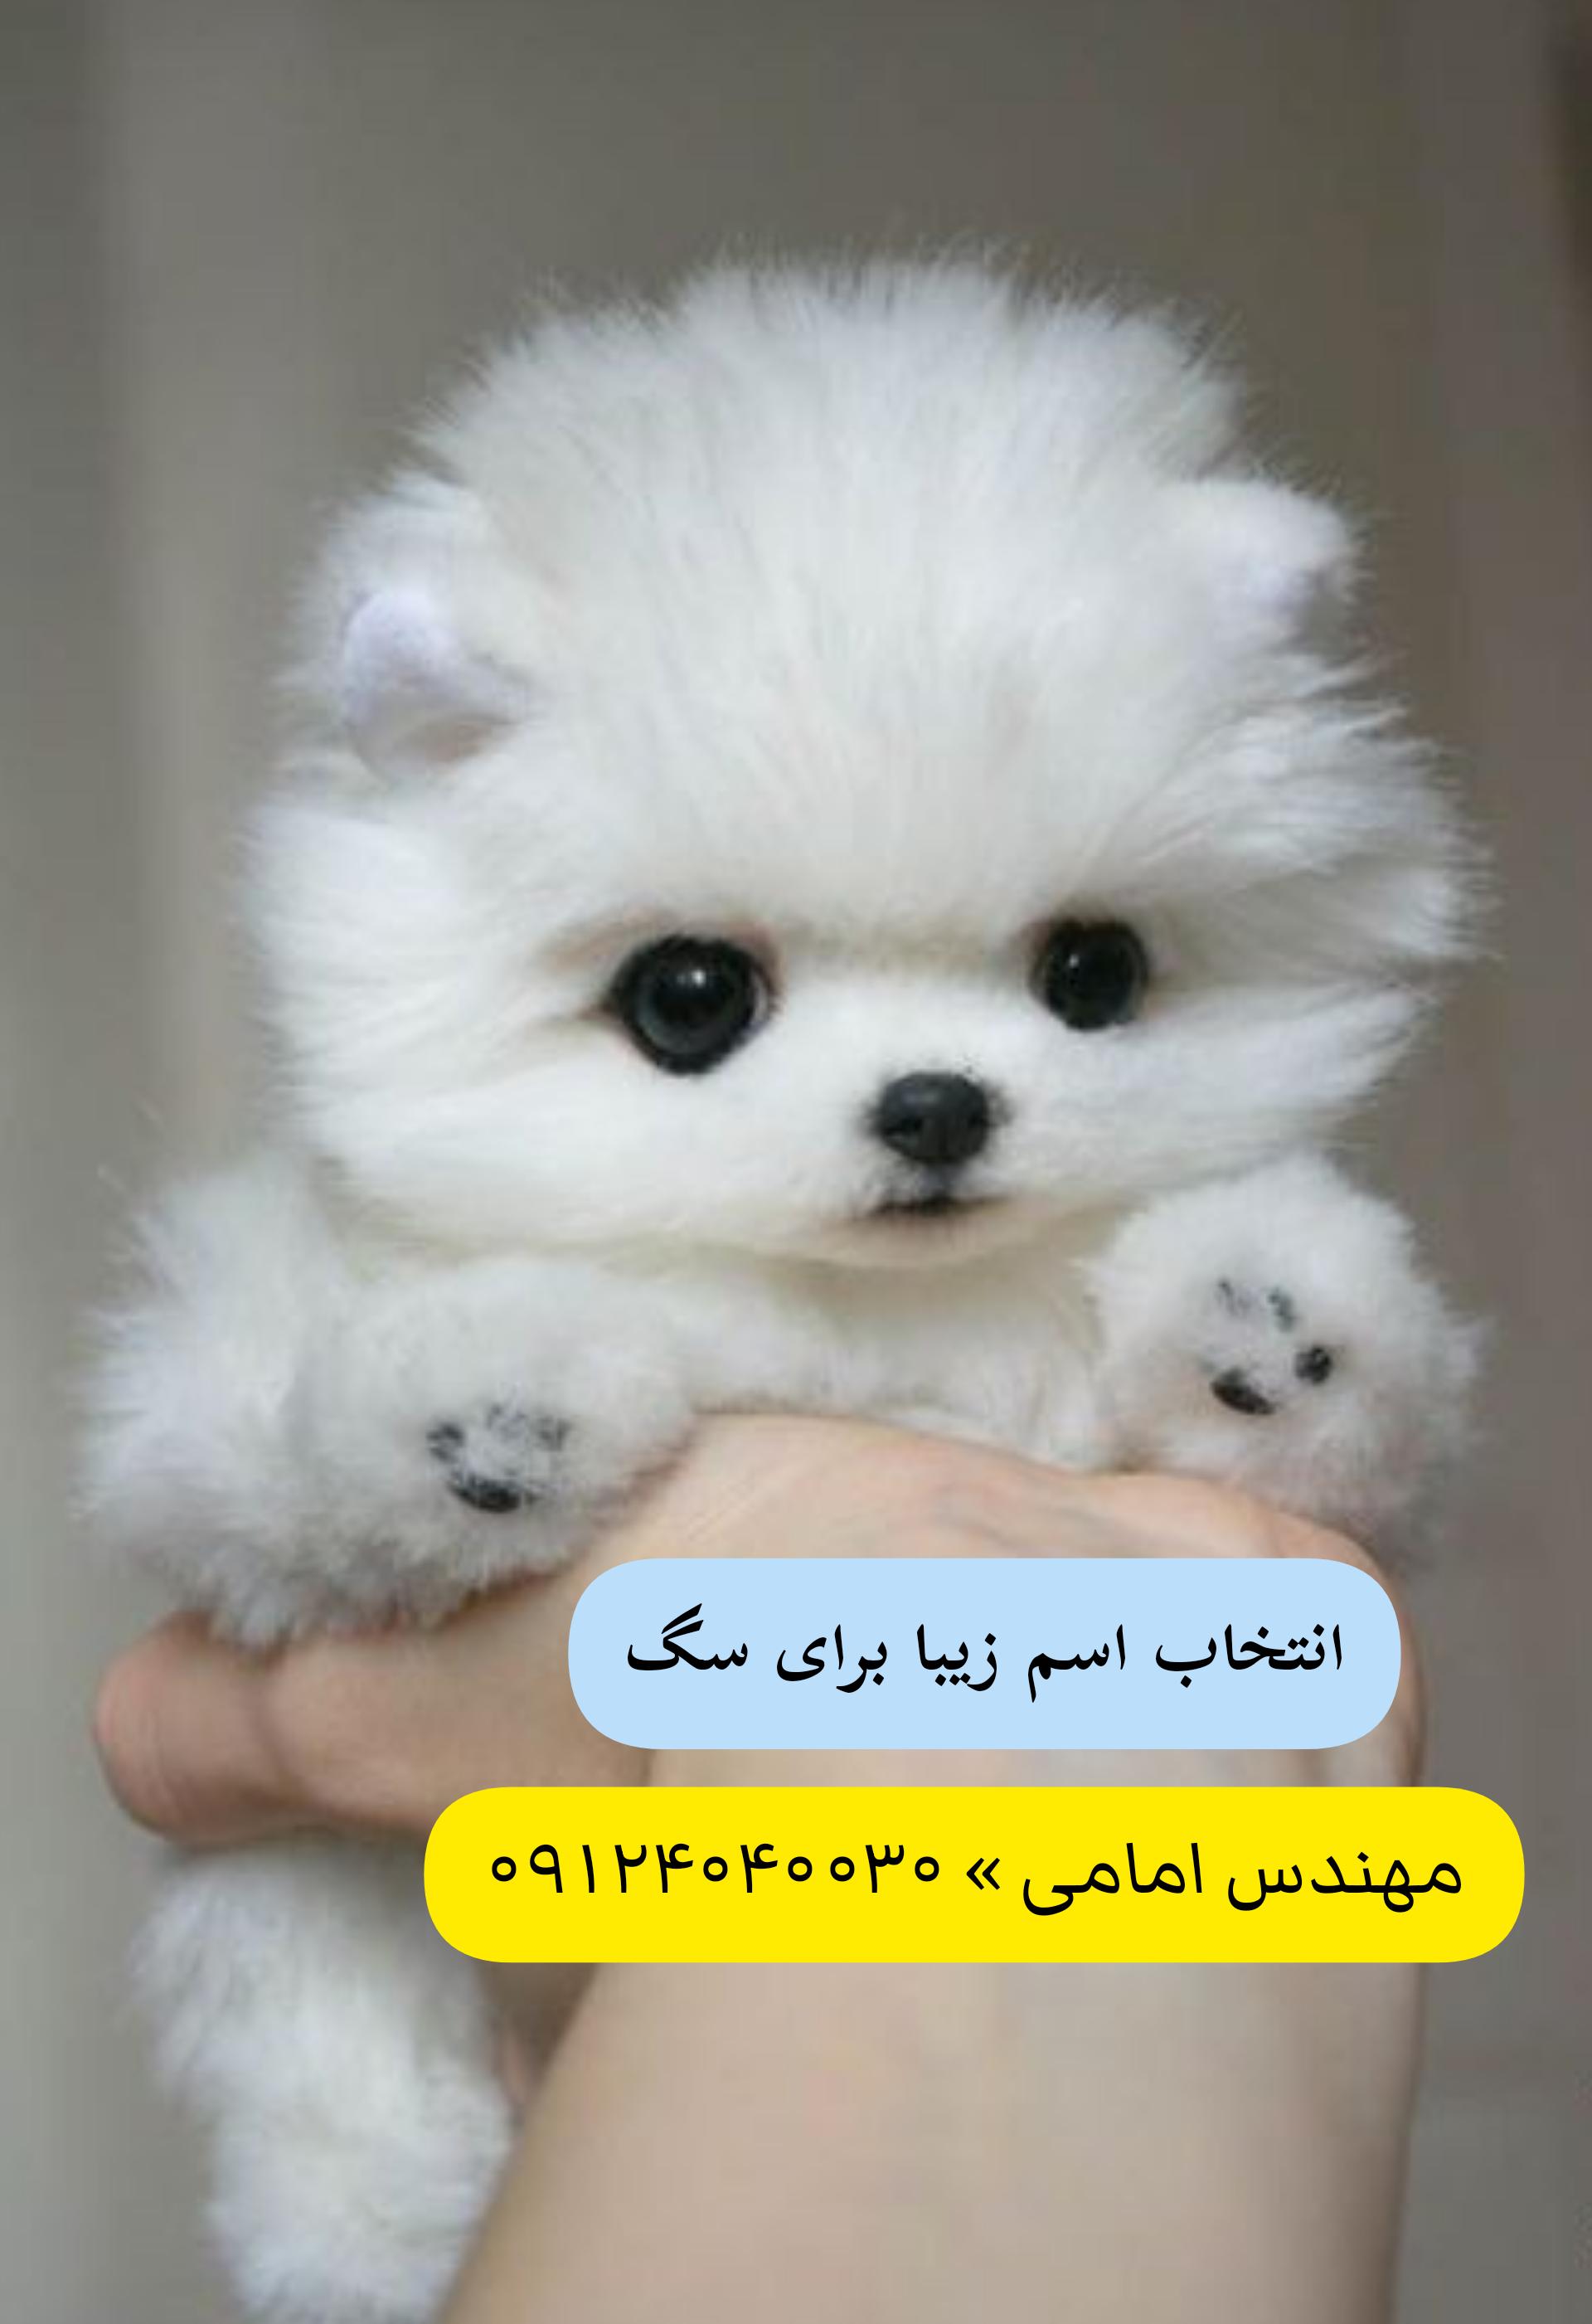 اسم سگ